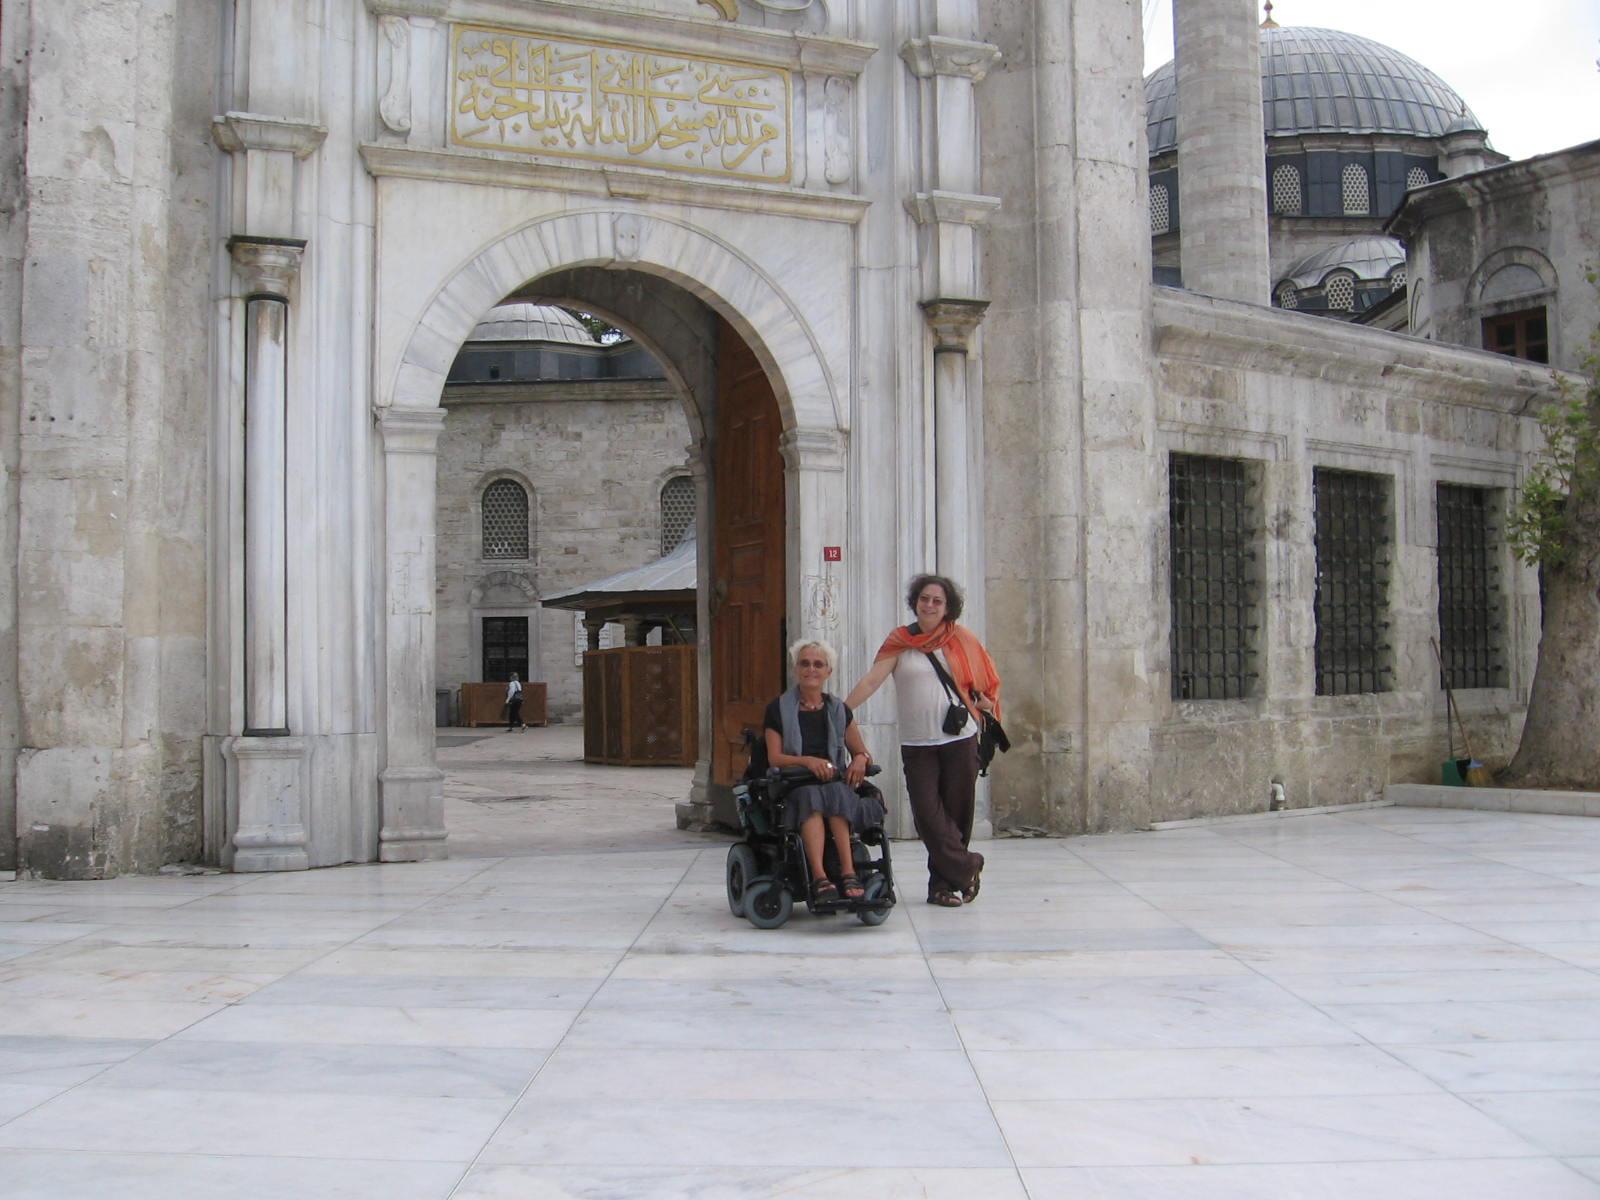 Helene-et-Louise-Mosquee copie